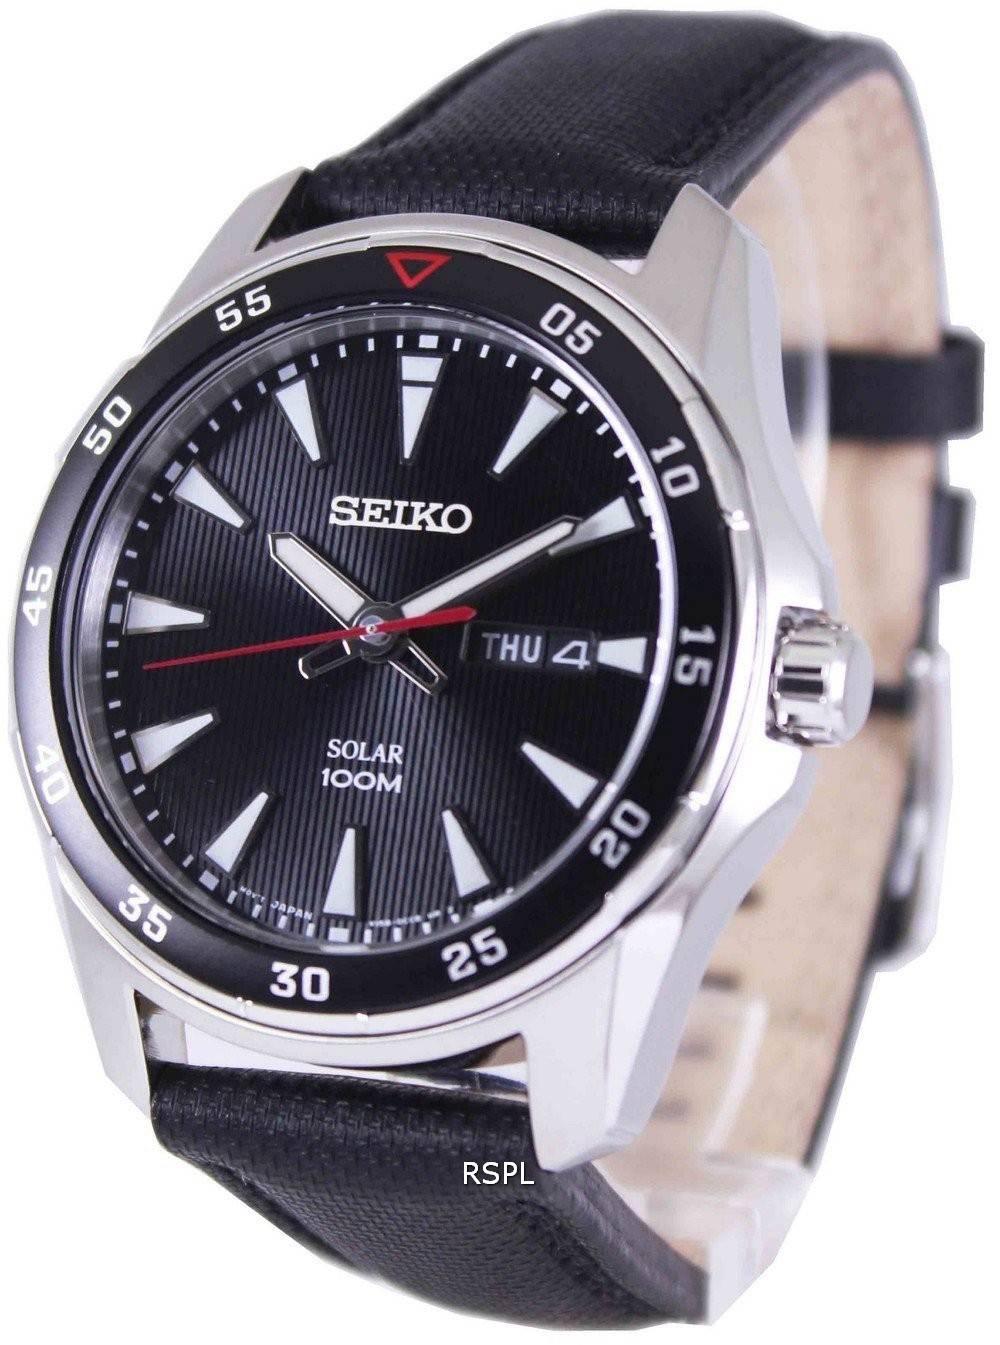 Seiko solar 100m sne393p2 mens watch for Seiko solar